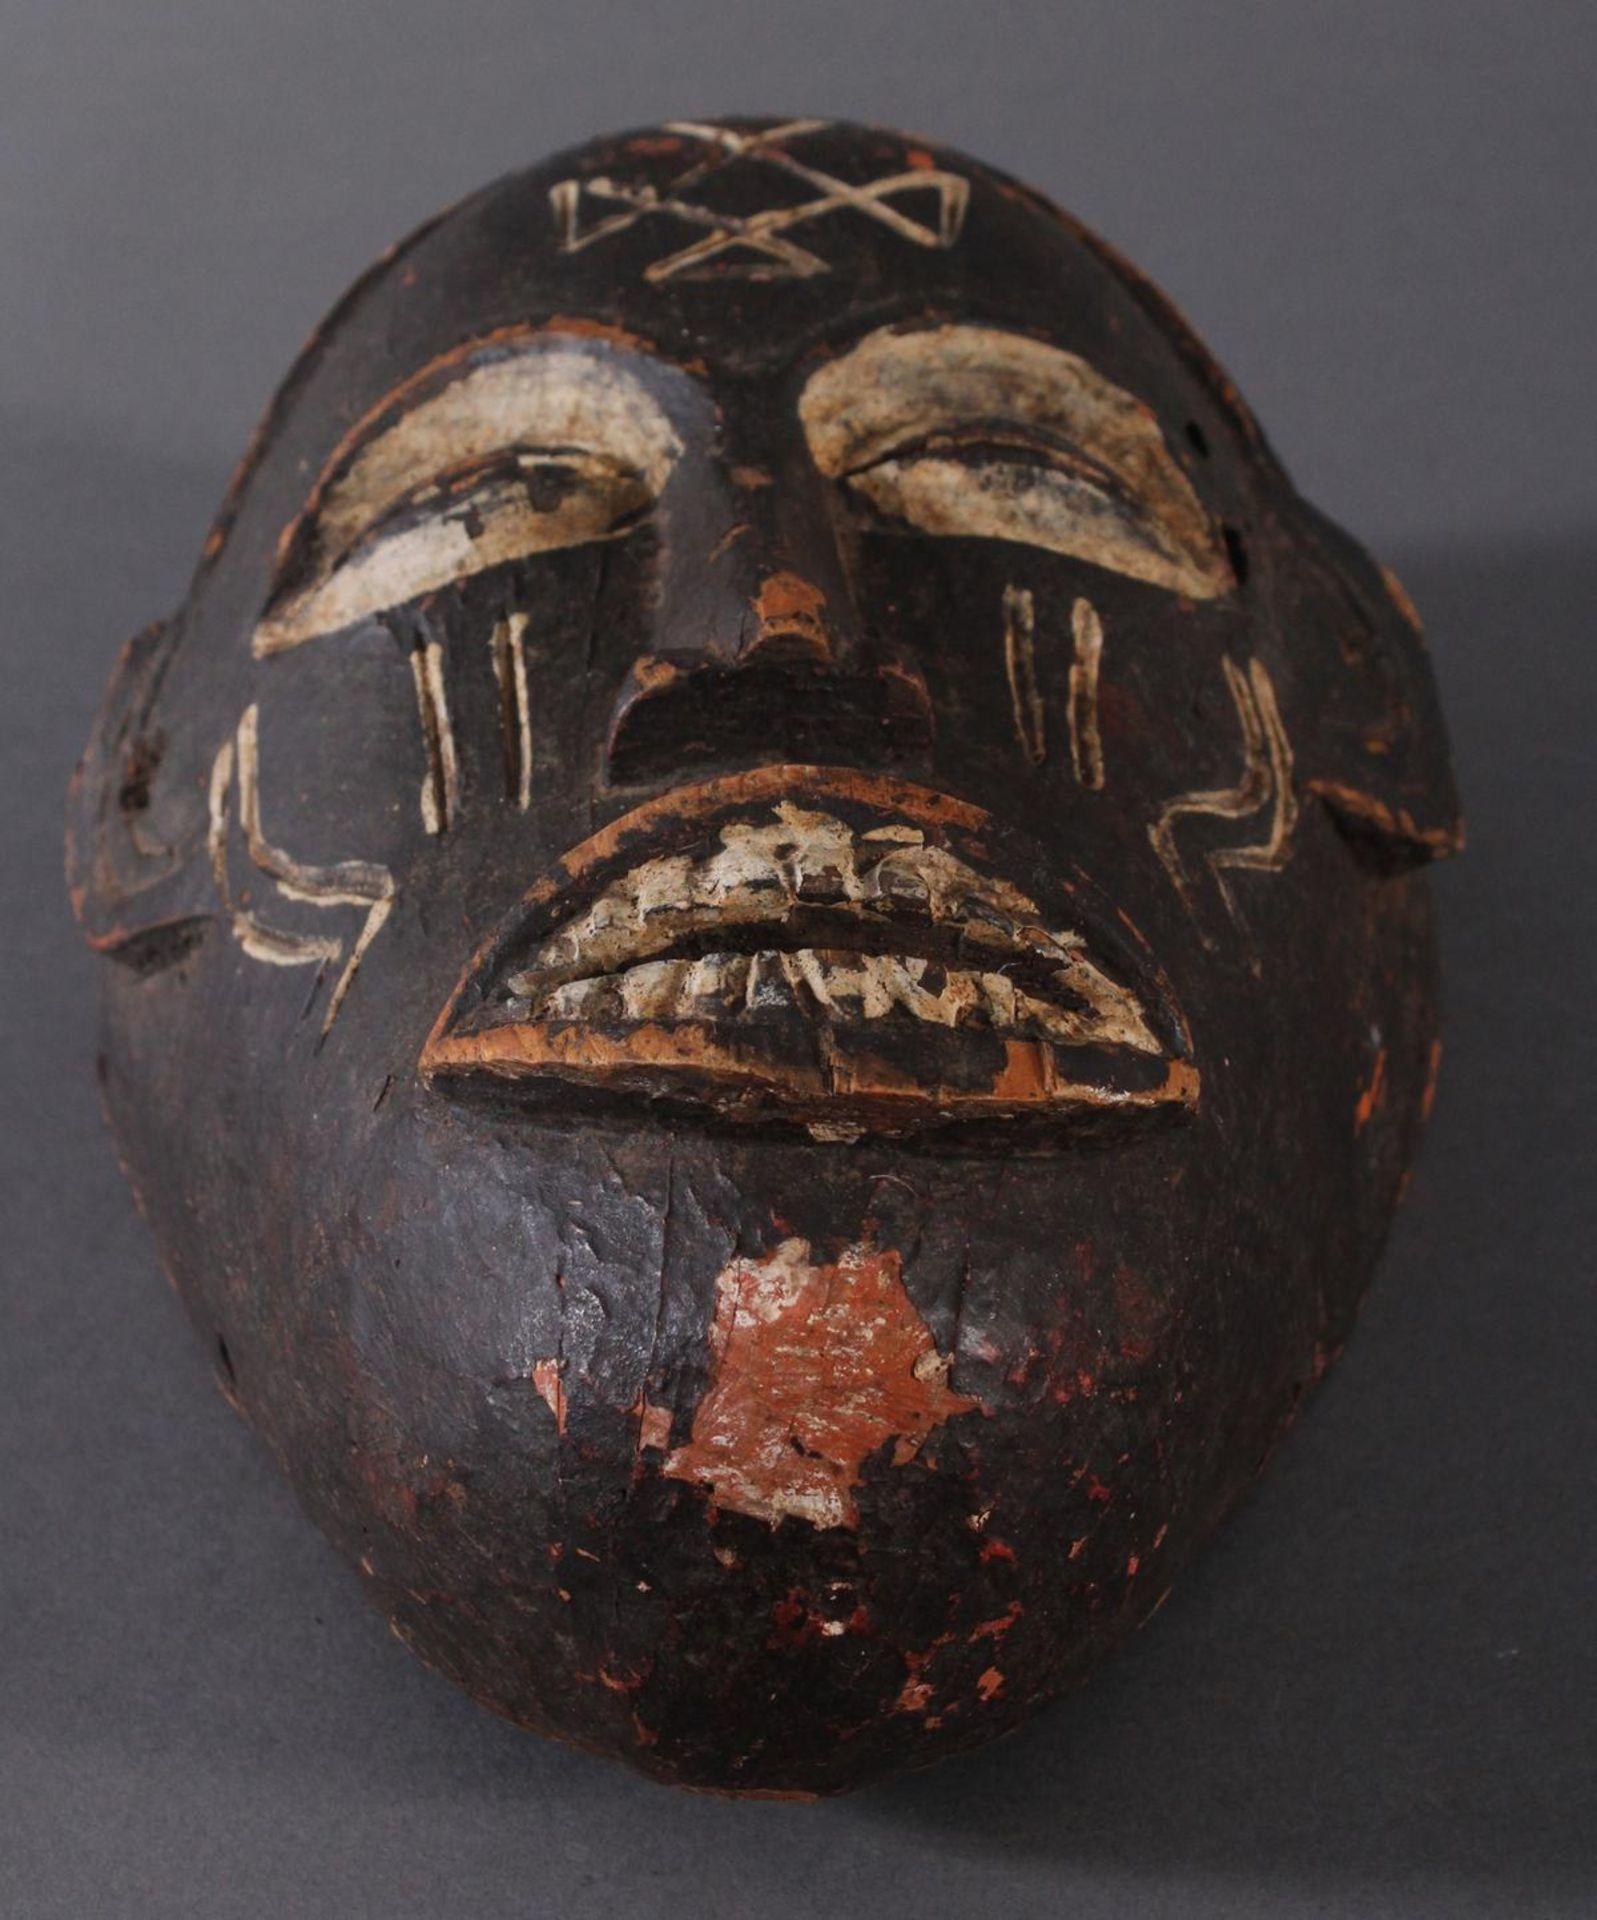 Antike Maske, Chokwe, Angola 1. Hälfte 20. Jh.Holz geschnitzt, dunkle Patina und Kaolin Bemalung, - Bild 4 aus 6